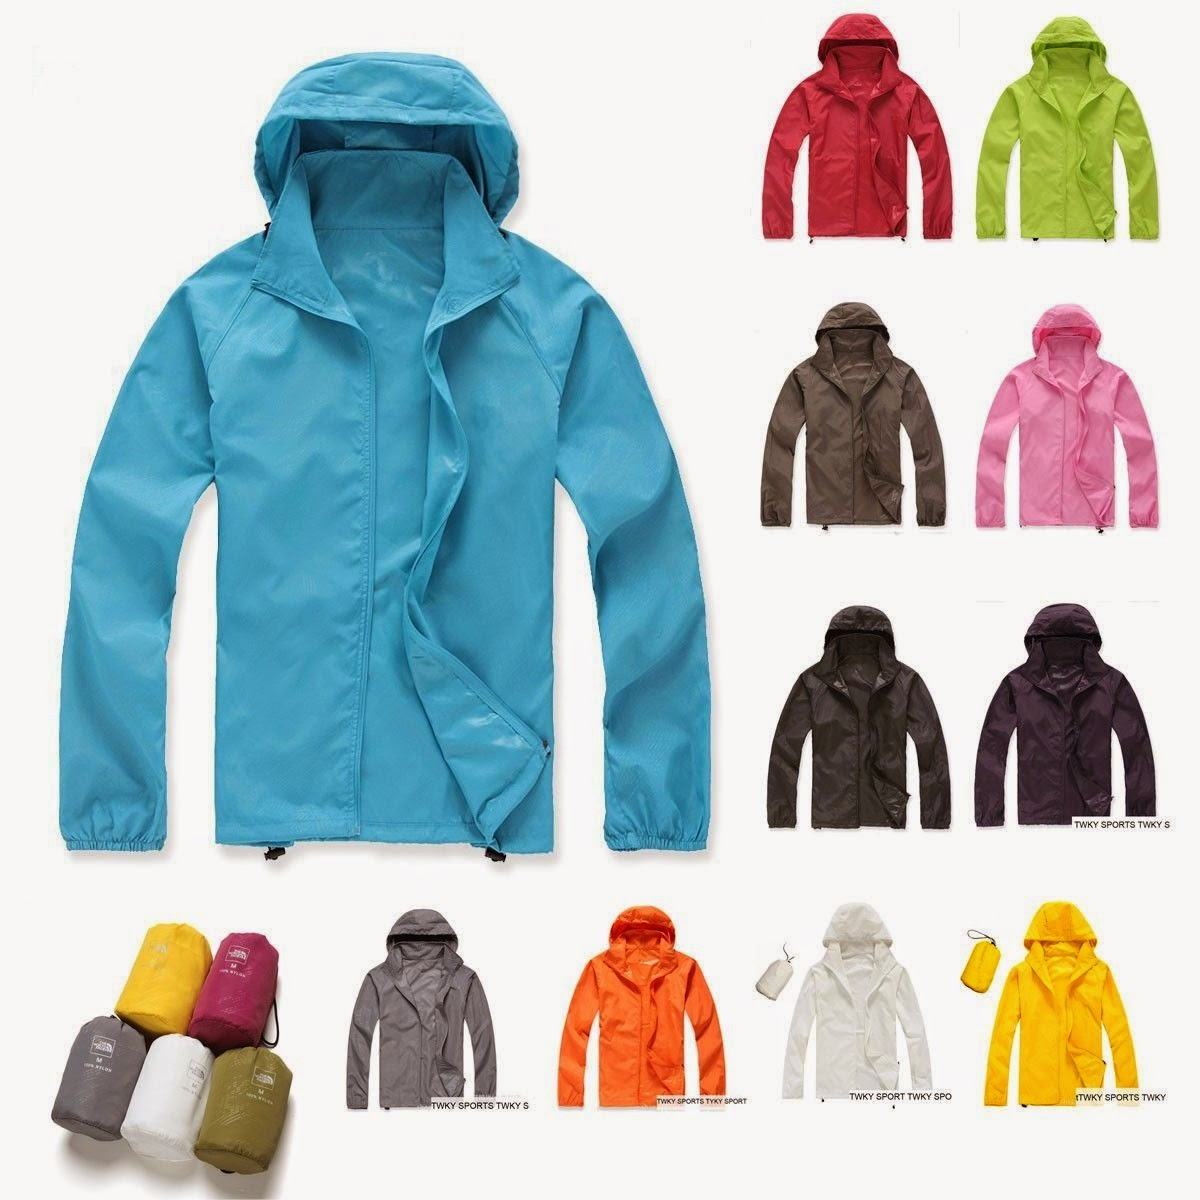 New Women Men Outwear Ski Snow Waterproof Climbing Hiking Outdoor Jackets